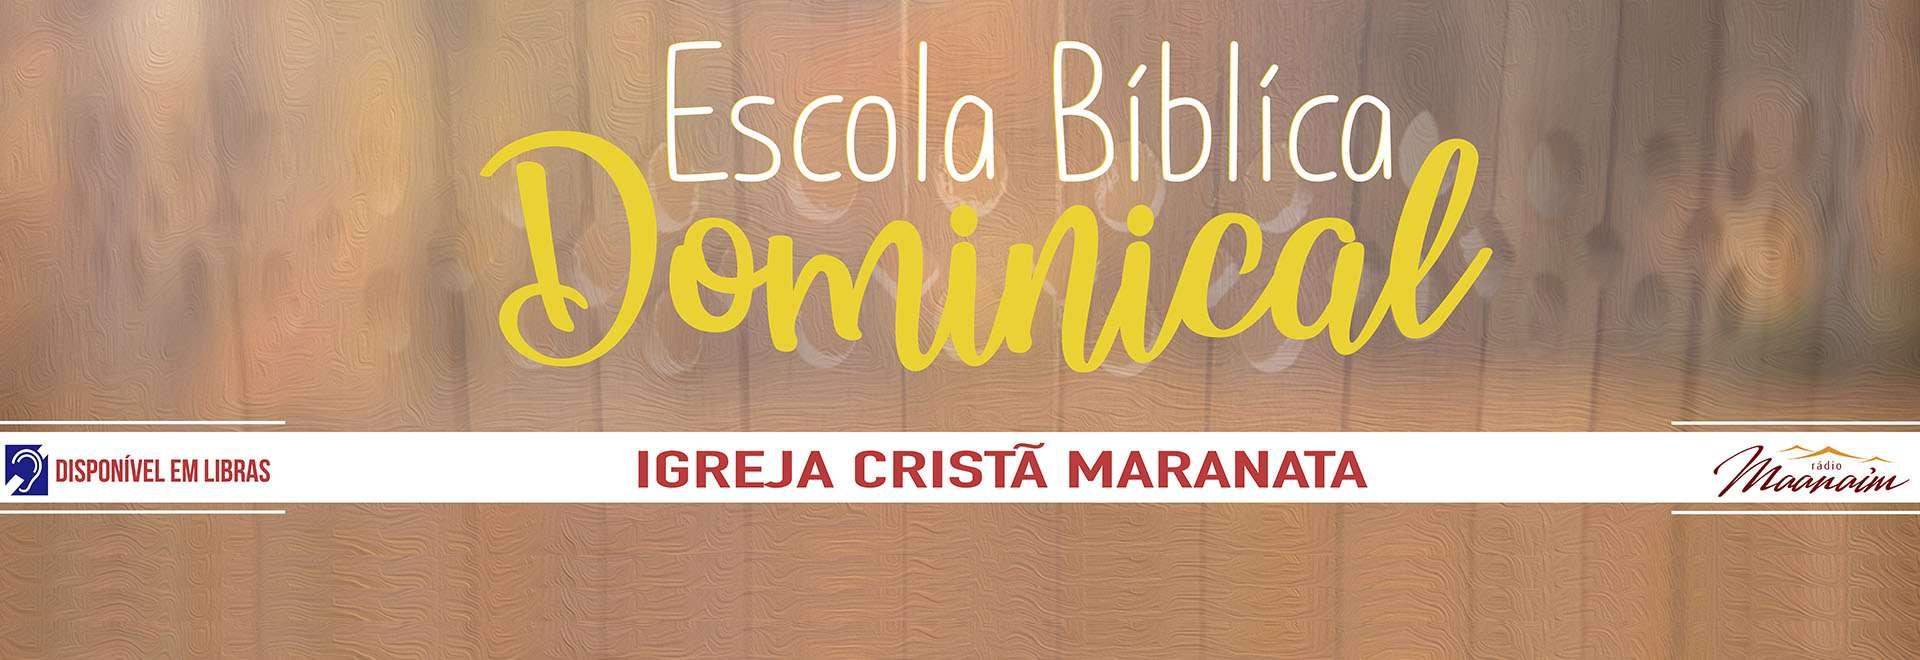 Participações da EBD da Igreja Cristã Maranata - 03/01/2020